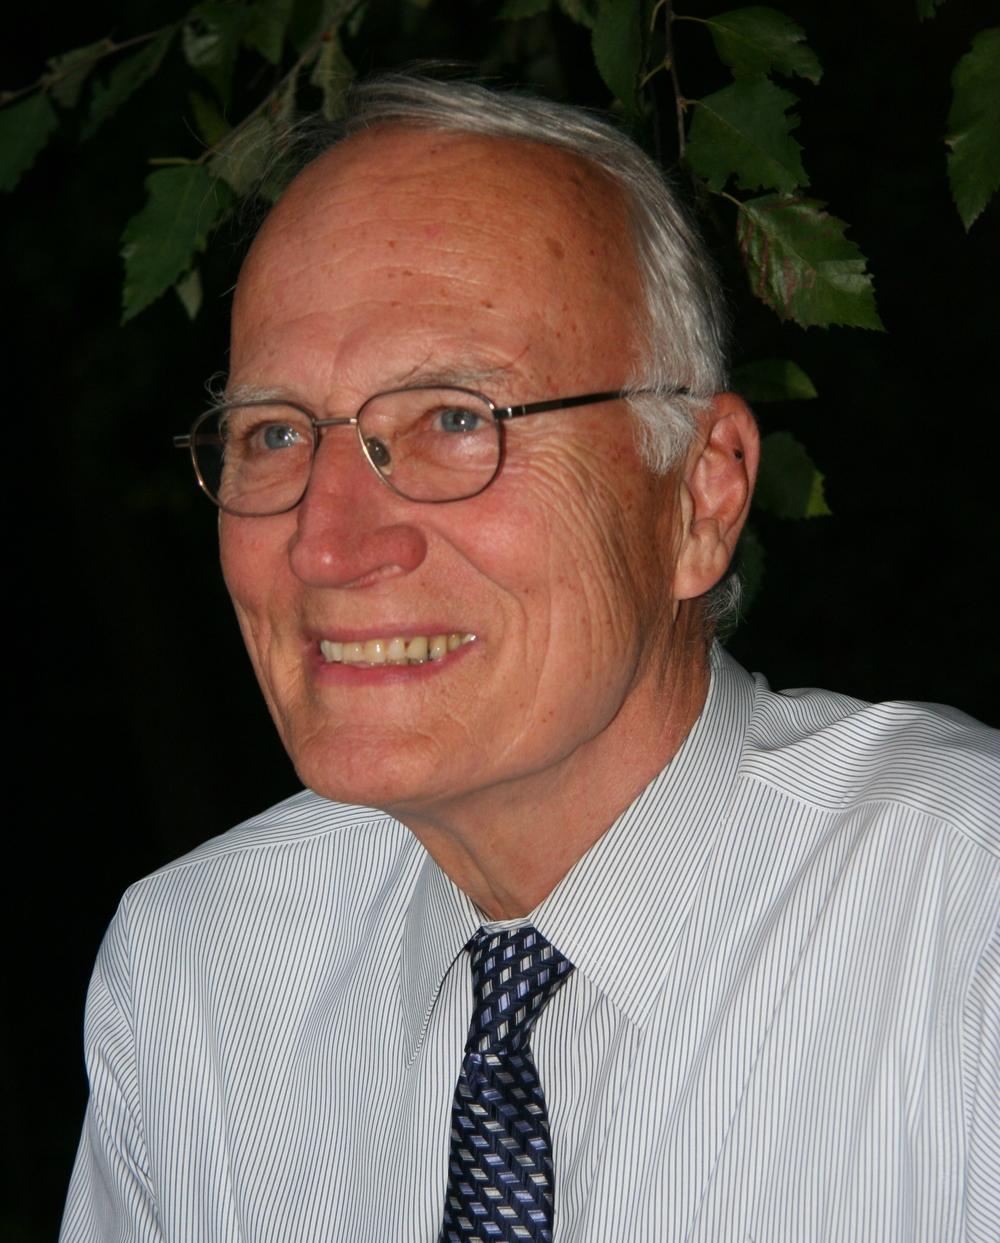 David Durenberger, former U.S. senator from Minnesota. Credit: Wikimedia Commons.